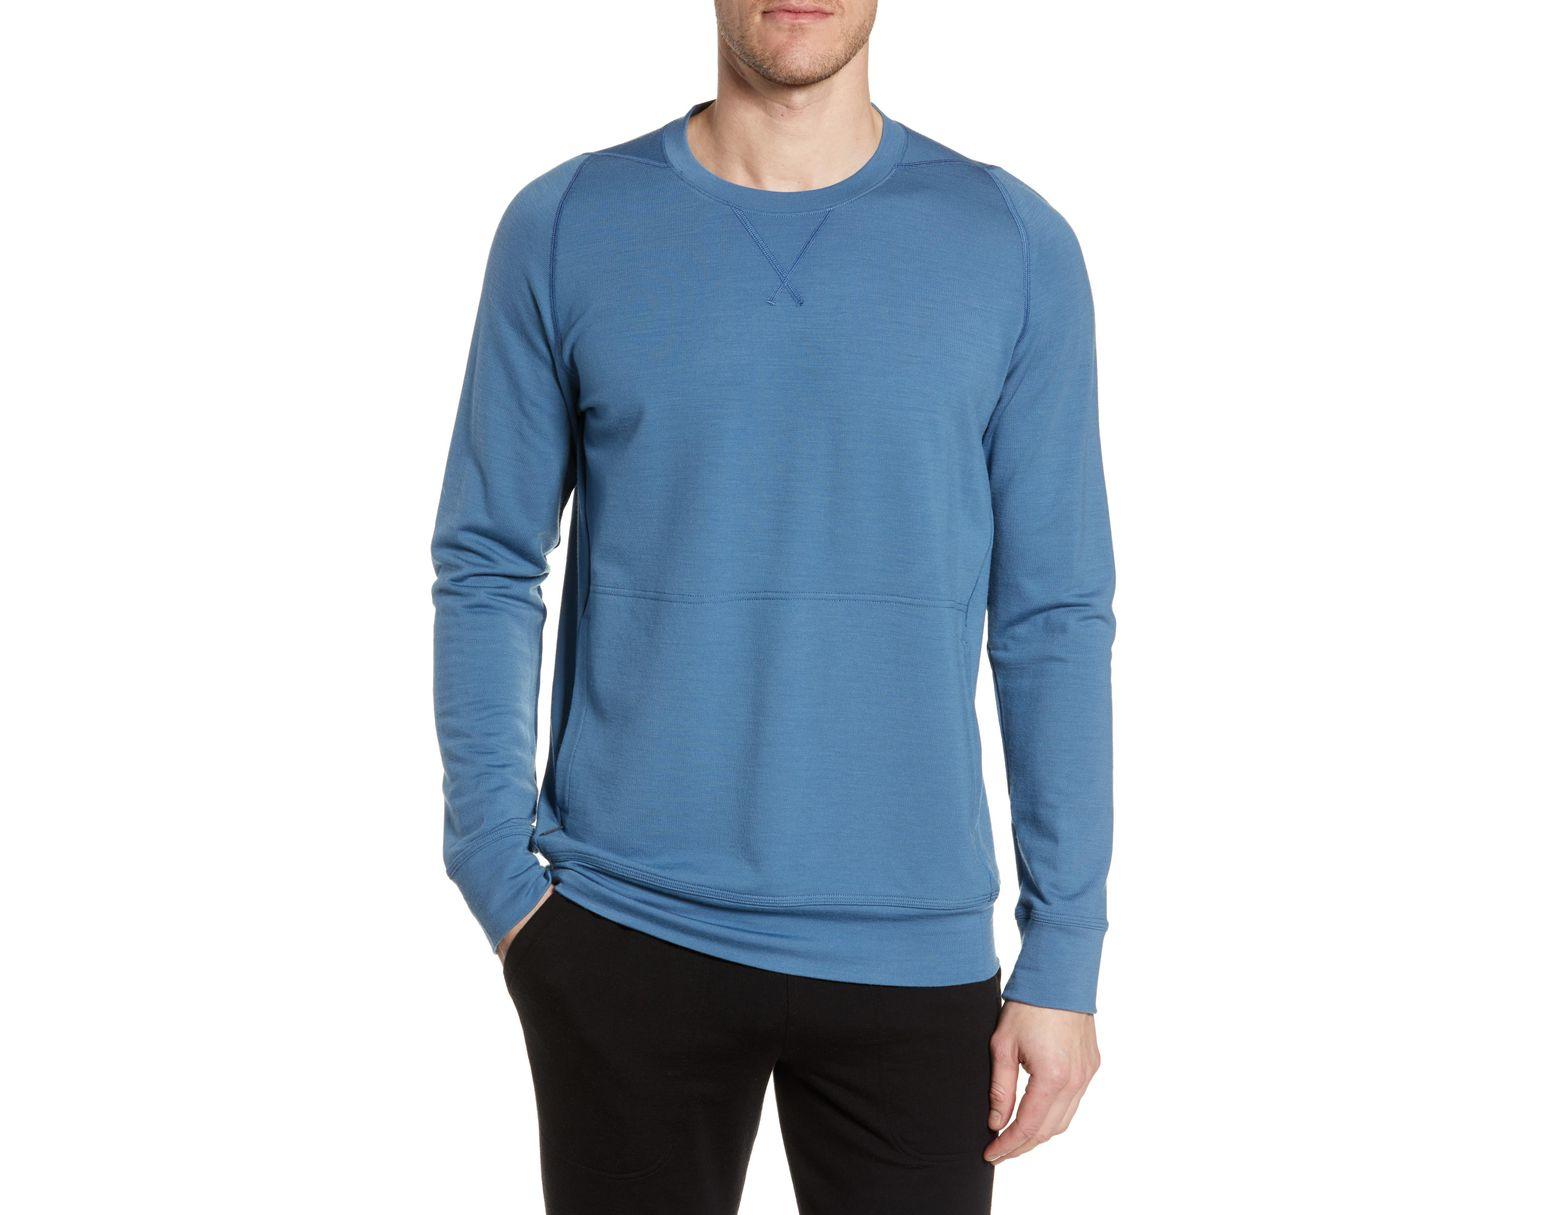 db42870e29 Icebreaker Shifter Merino Wool Blend Crewneck Sweater in Blue for Men - Lyst